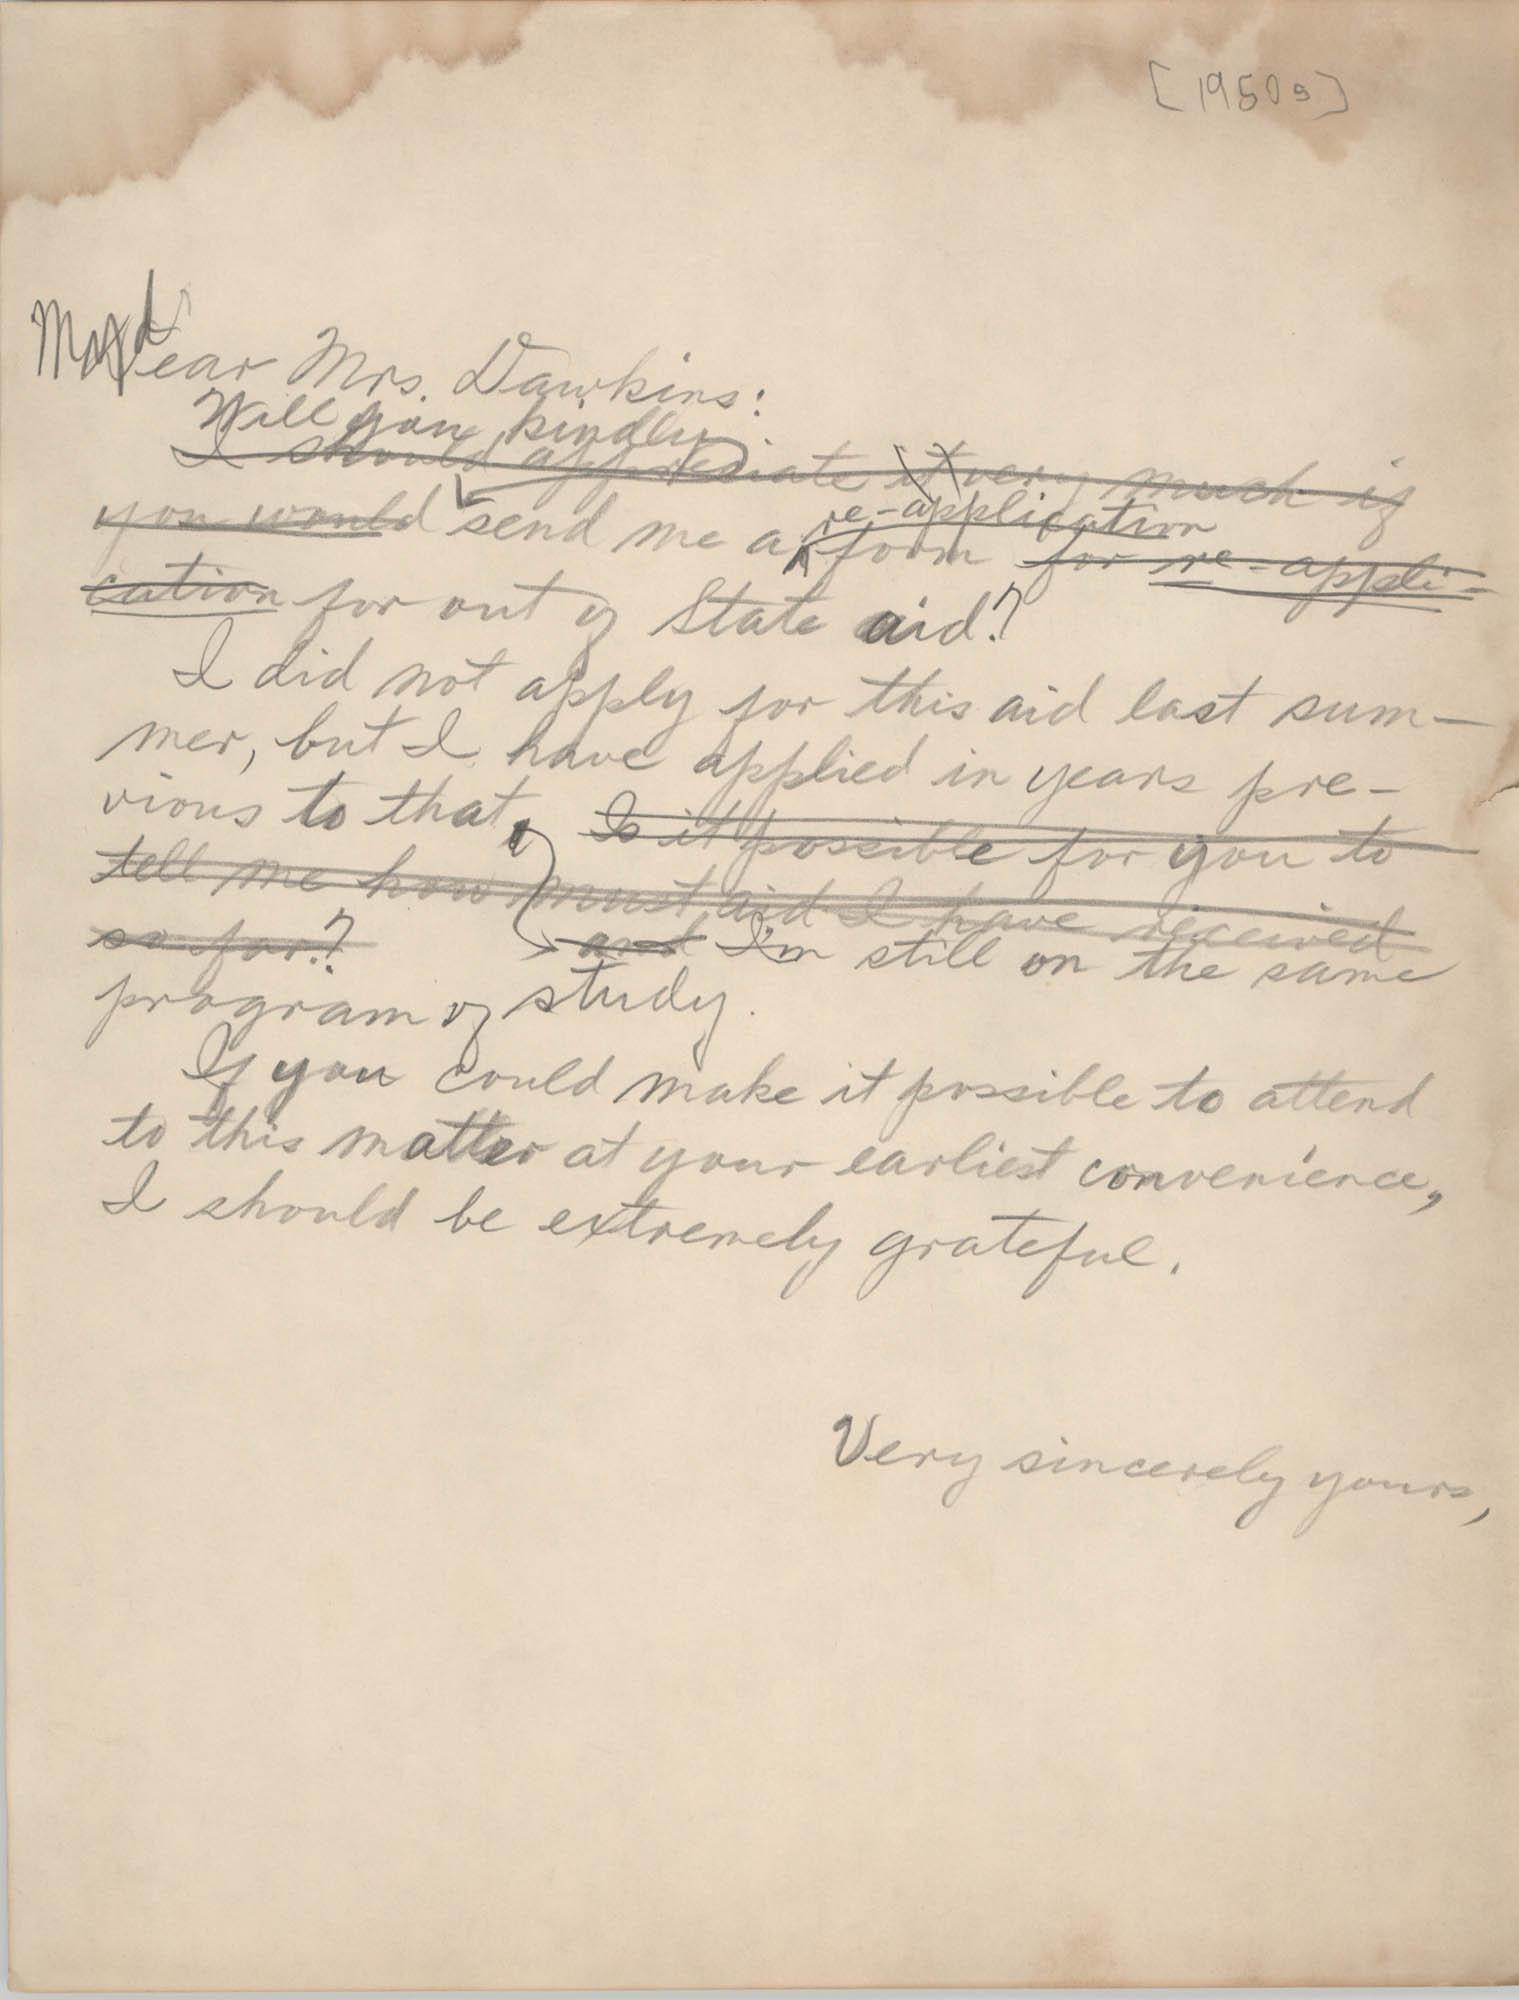 Letter from Eugene C. Hunt to